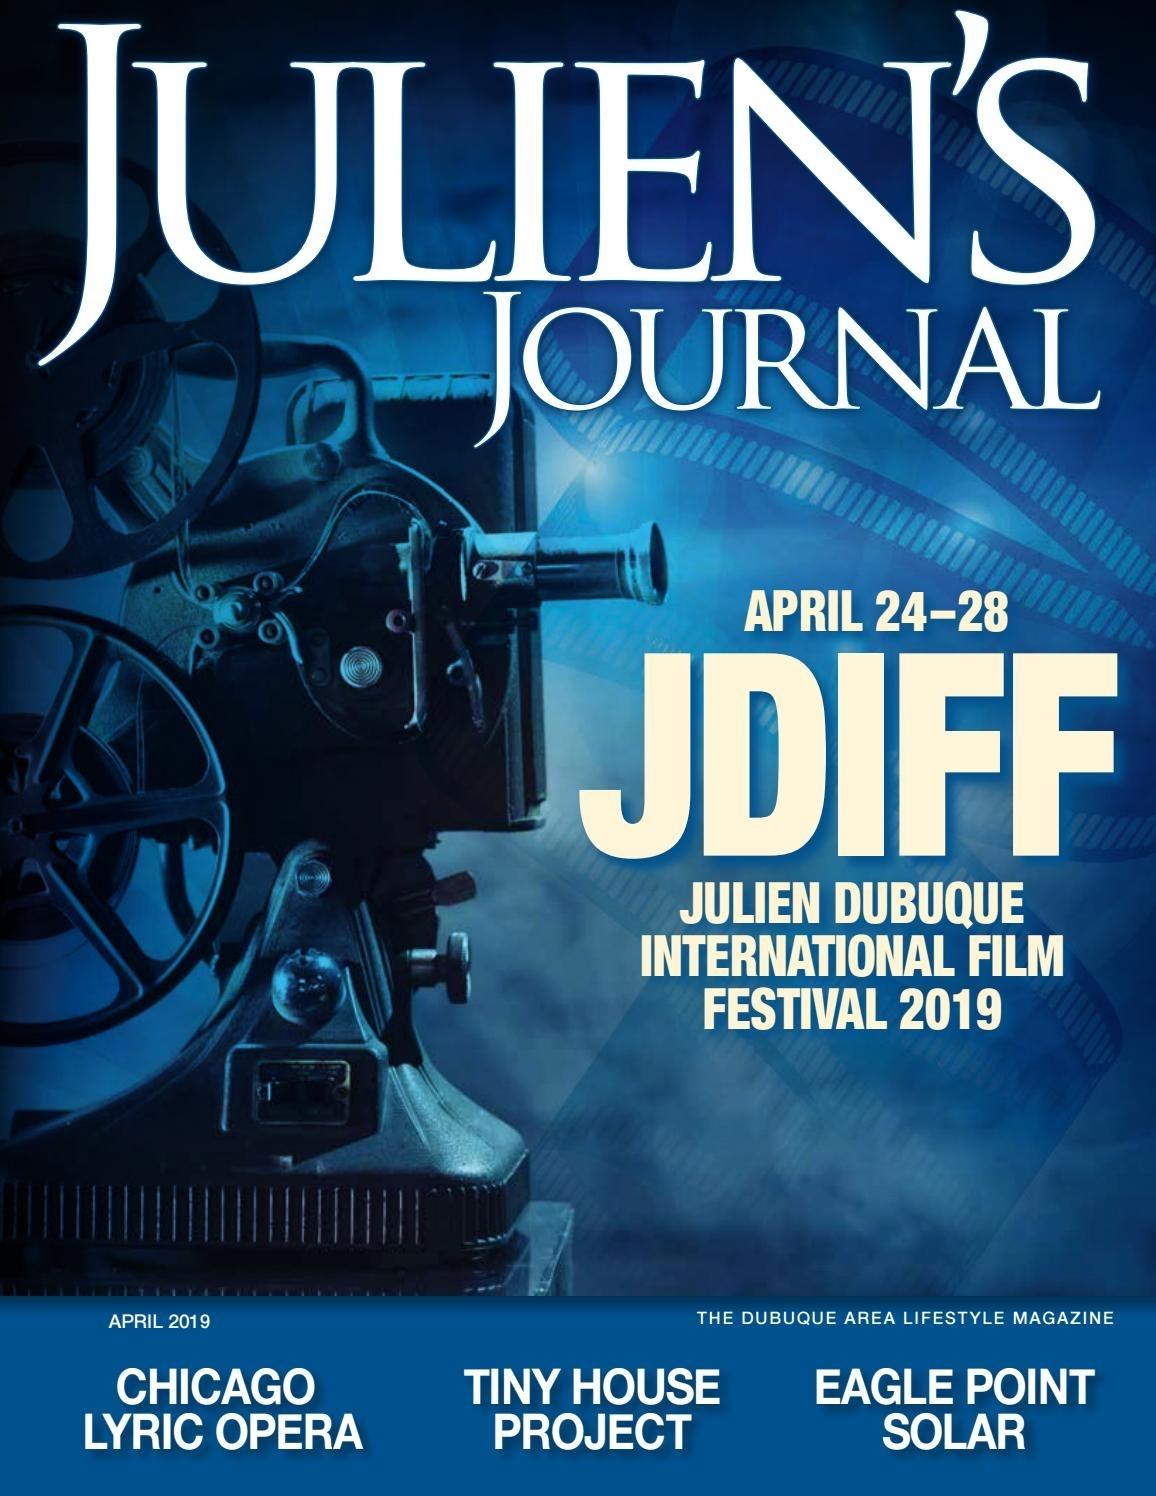 April 2019 (Volume 44, Number 4)Julien's Journal - Issuu regarding Super Bowl Sunday Lyrics Maps And Atlases